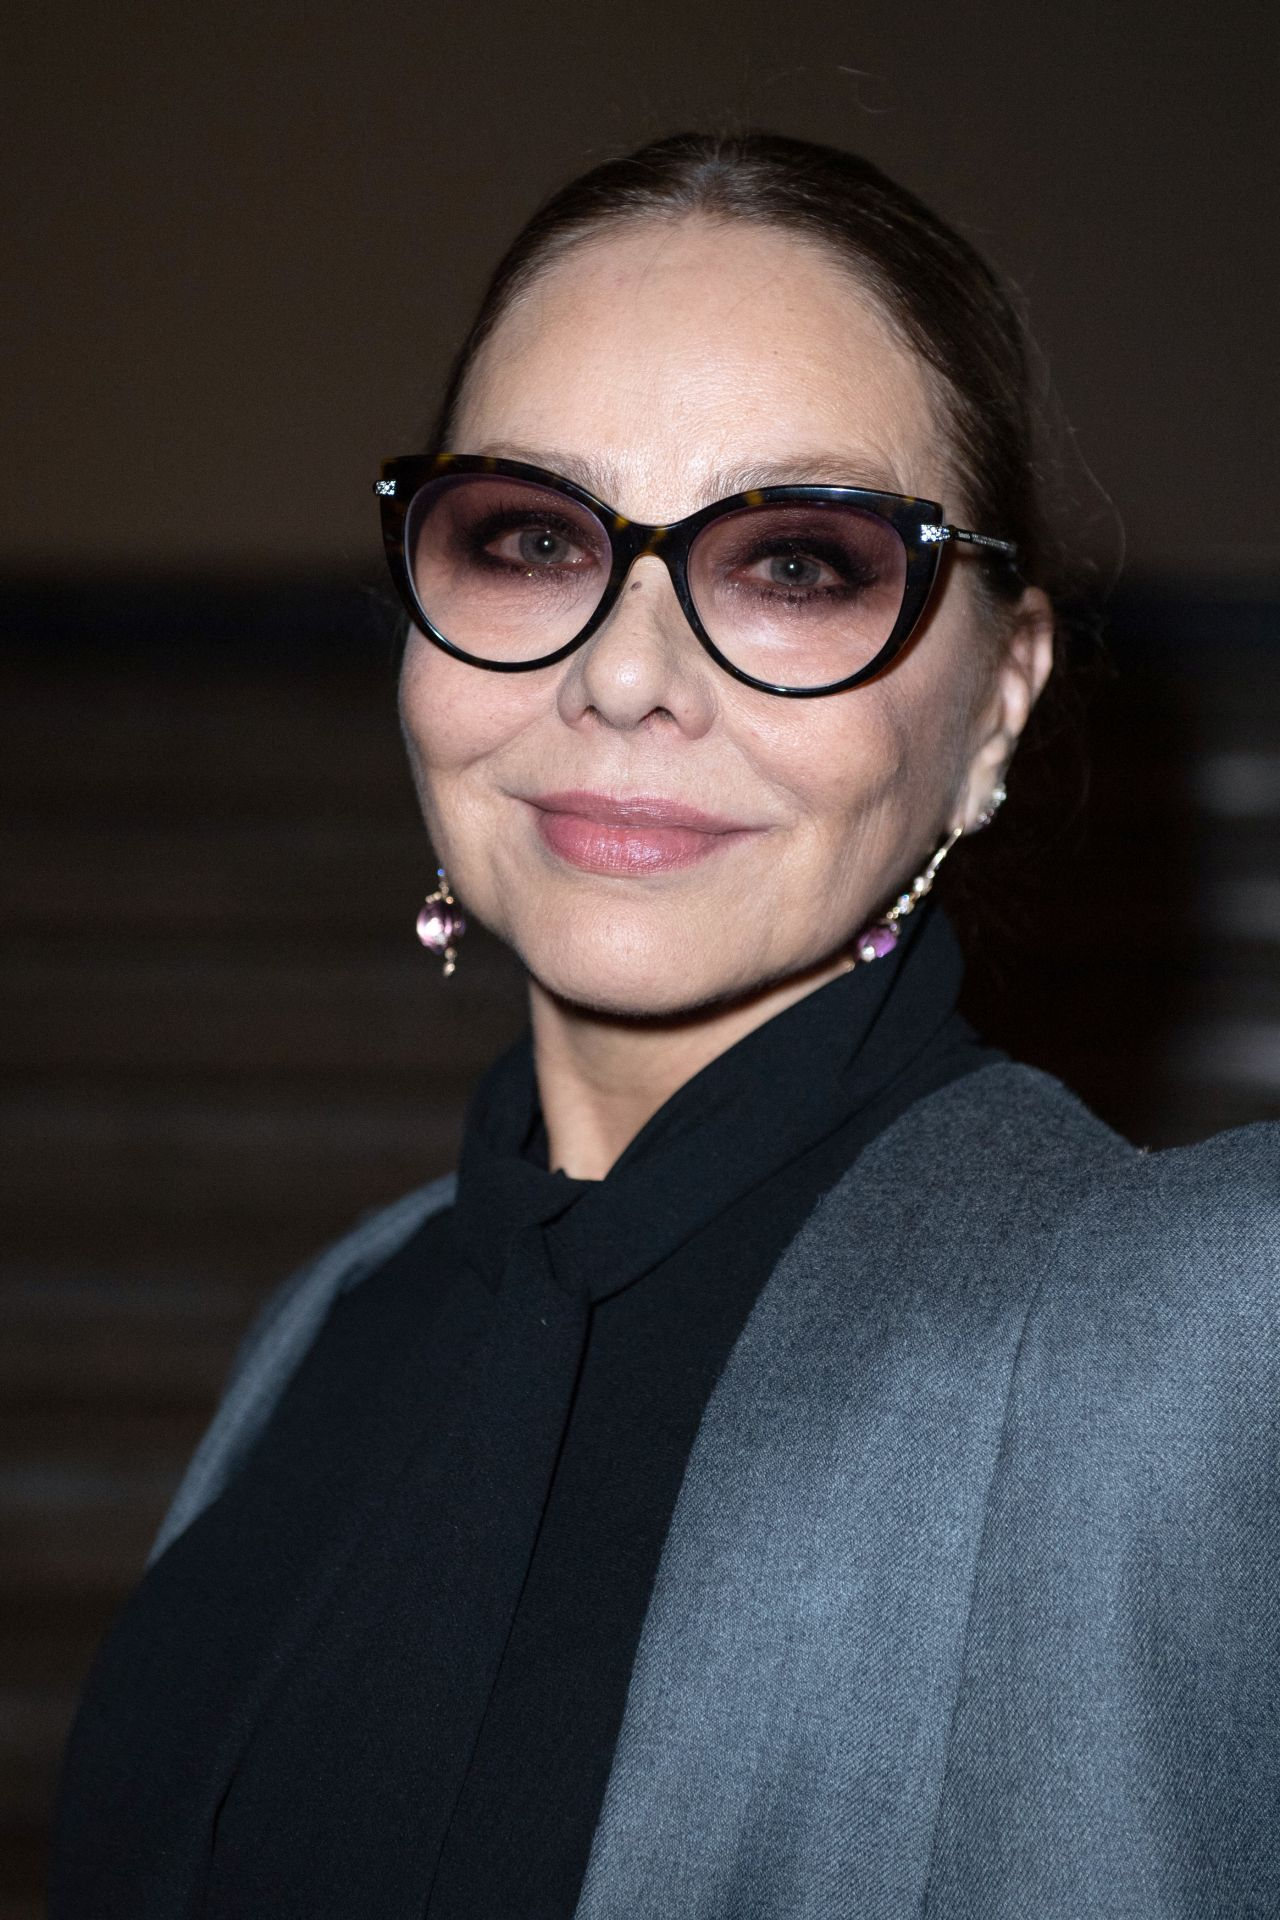 Ornella Muti - Antonio Grimaldi Show at Paris Fashion Week